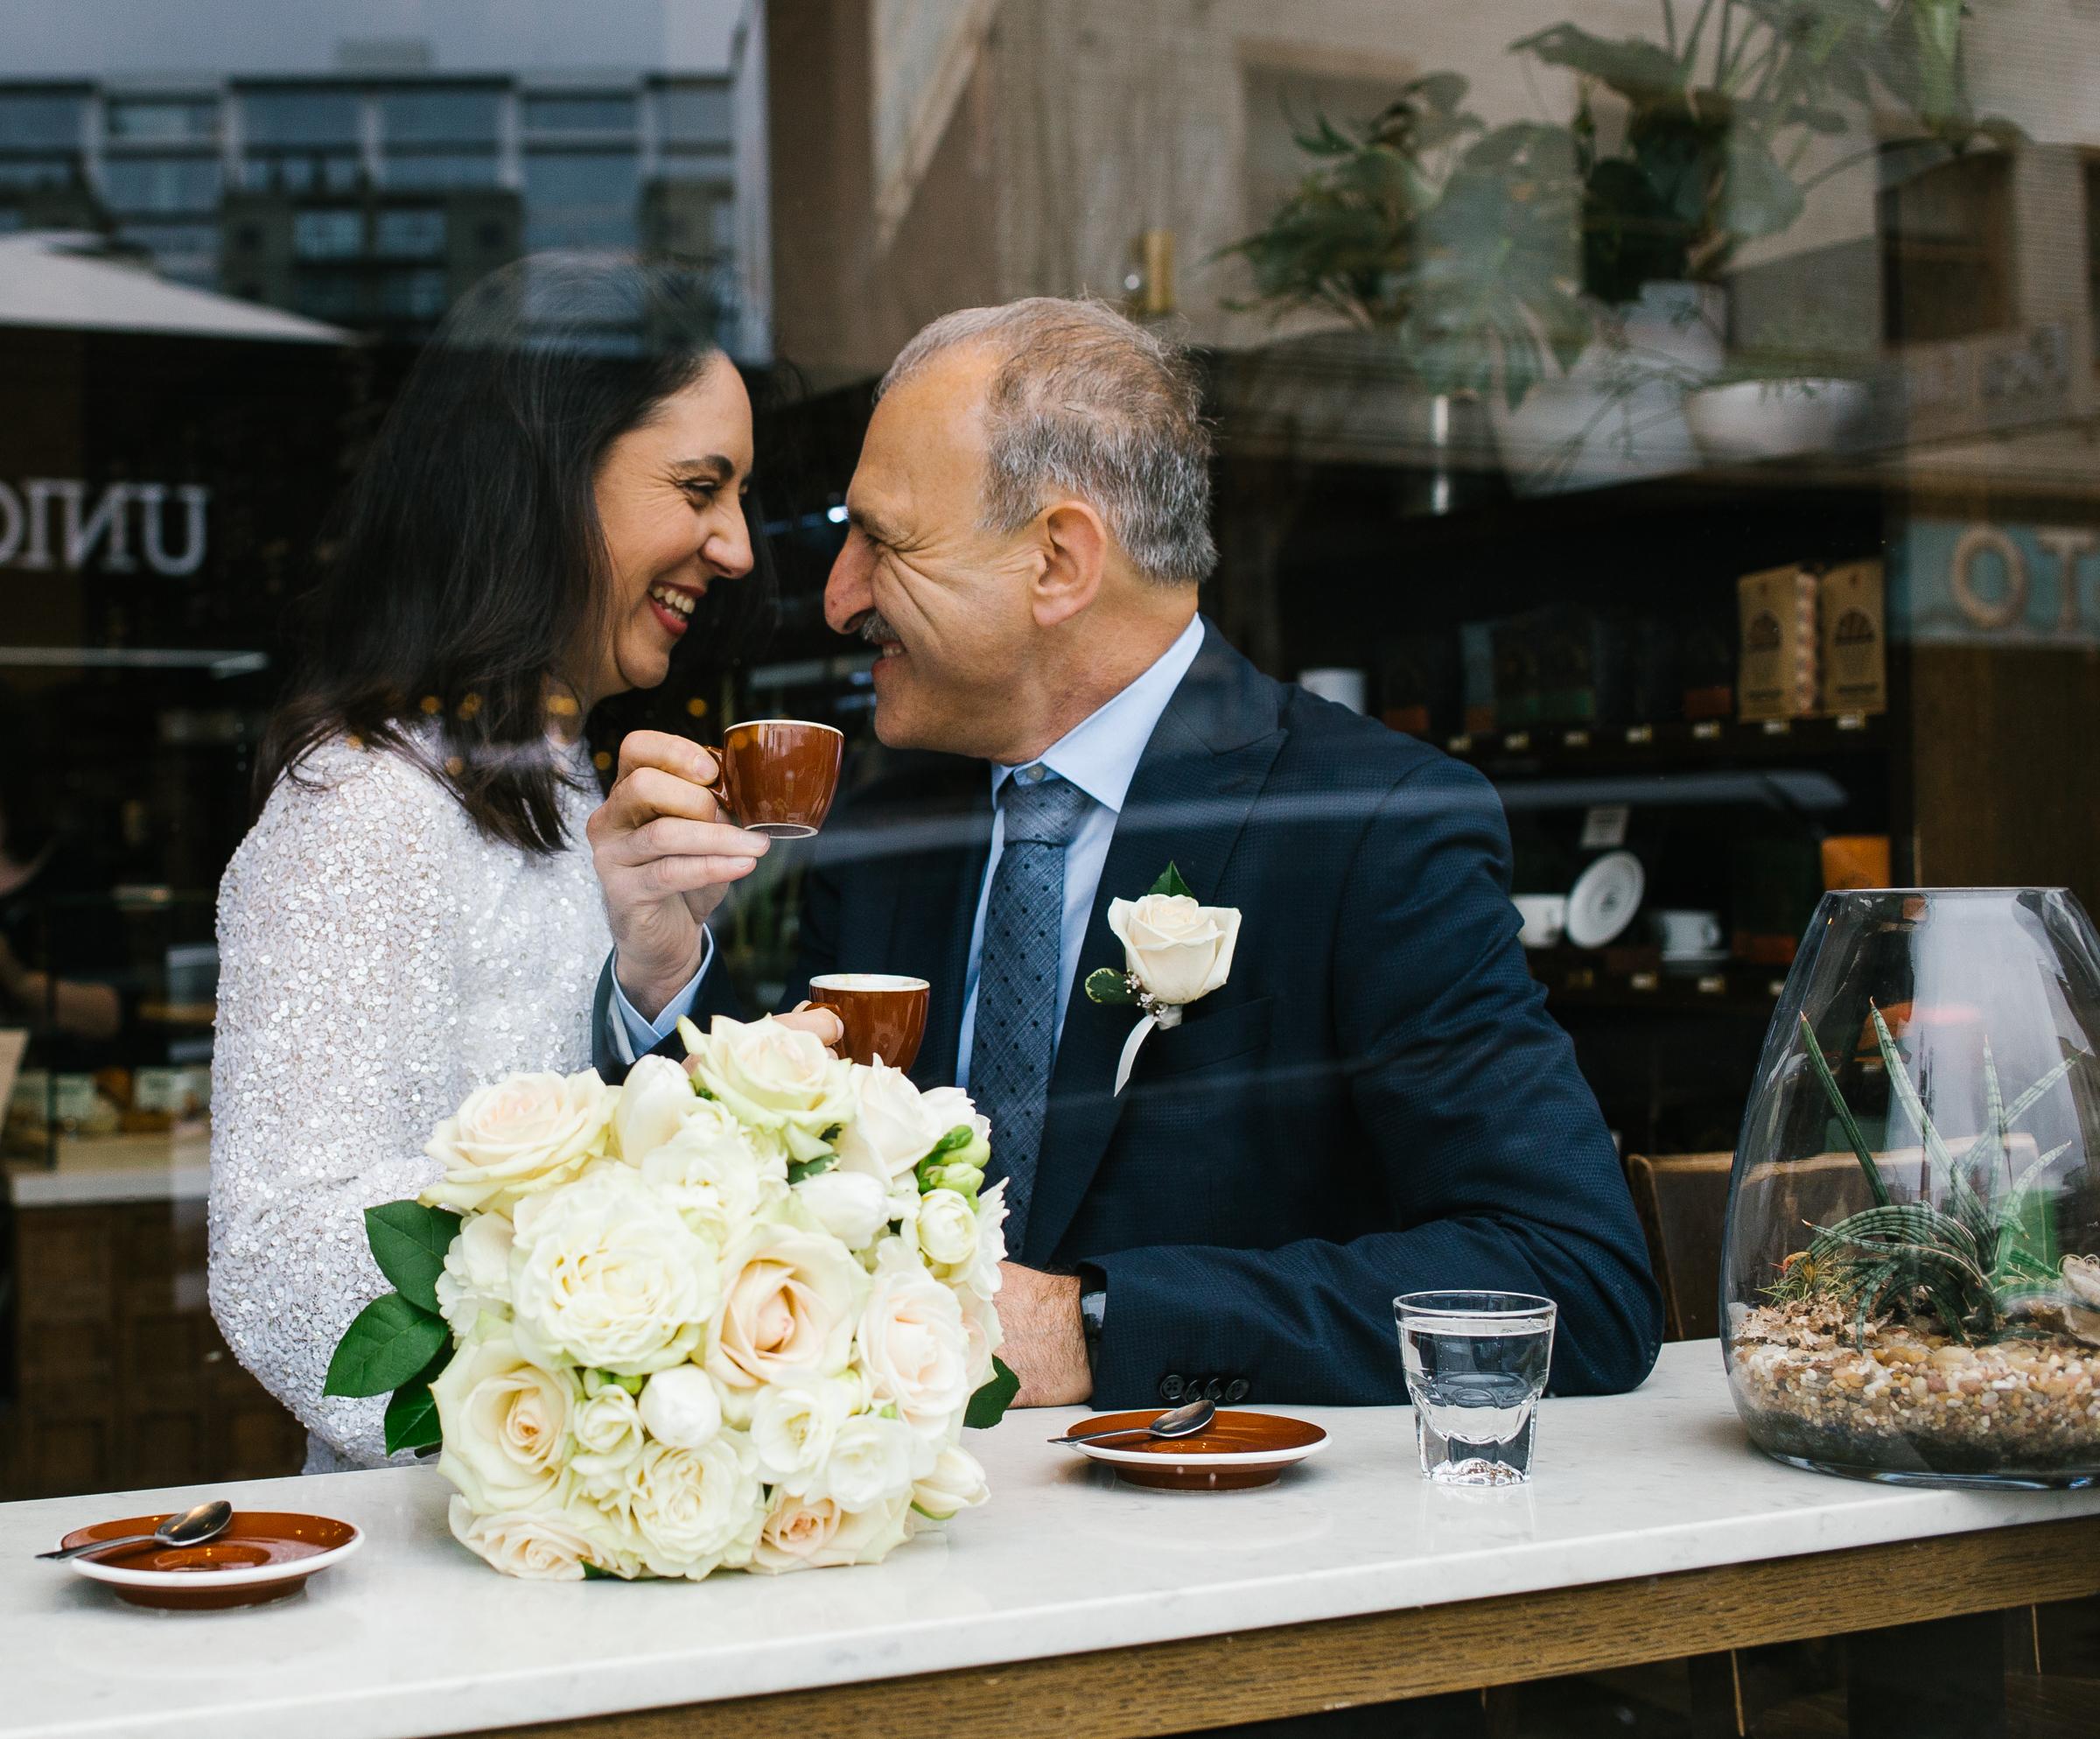 Linda + Moreno - a rainy downtown elopement